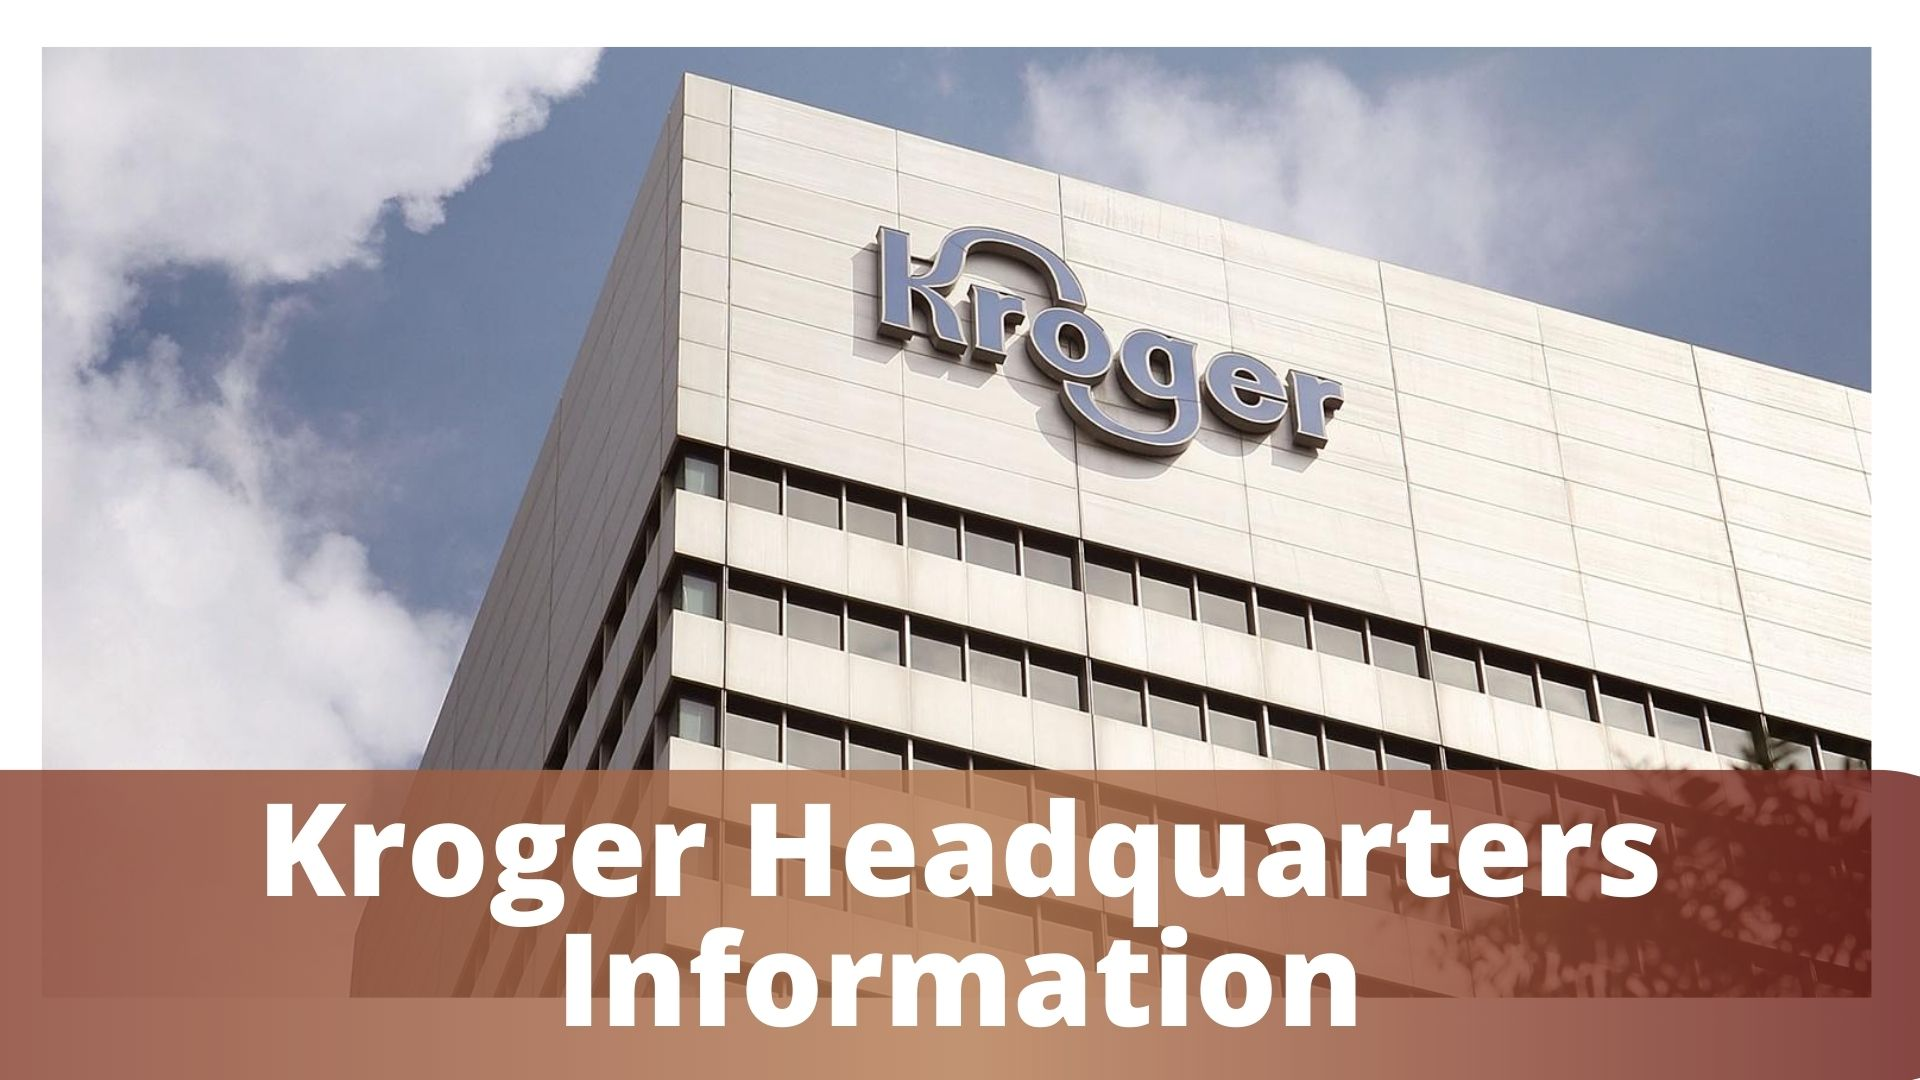 Kroger Headquarters Information